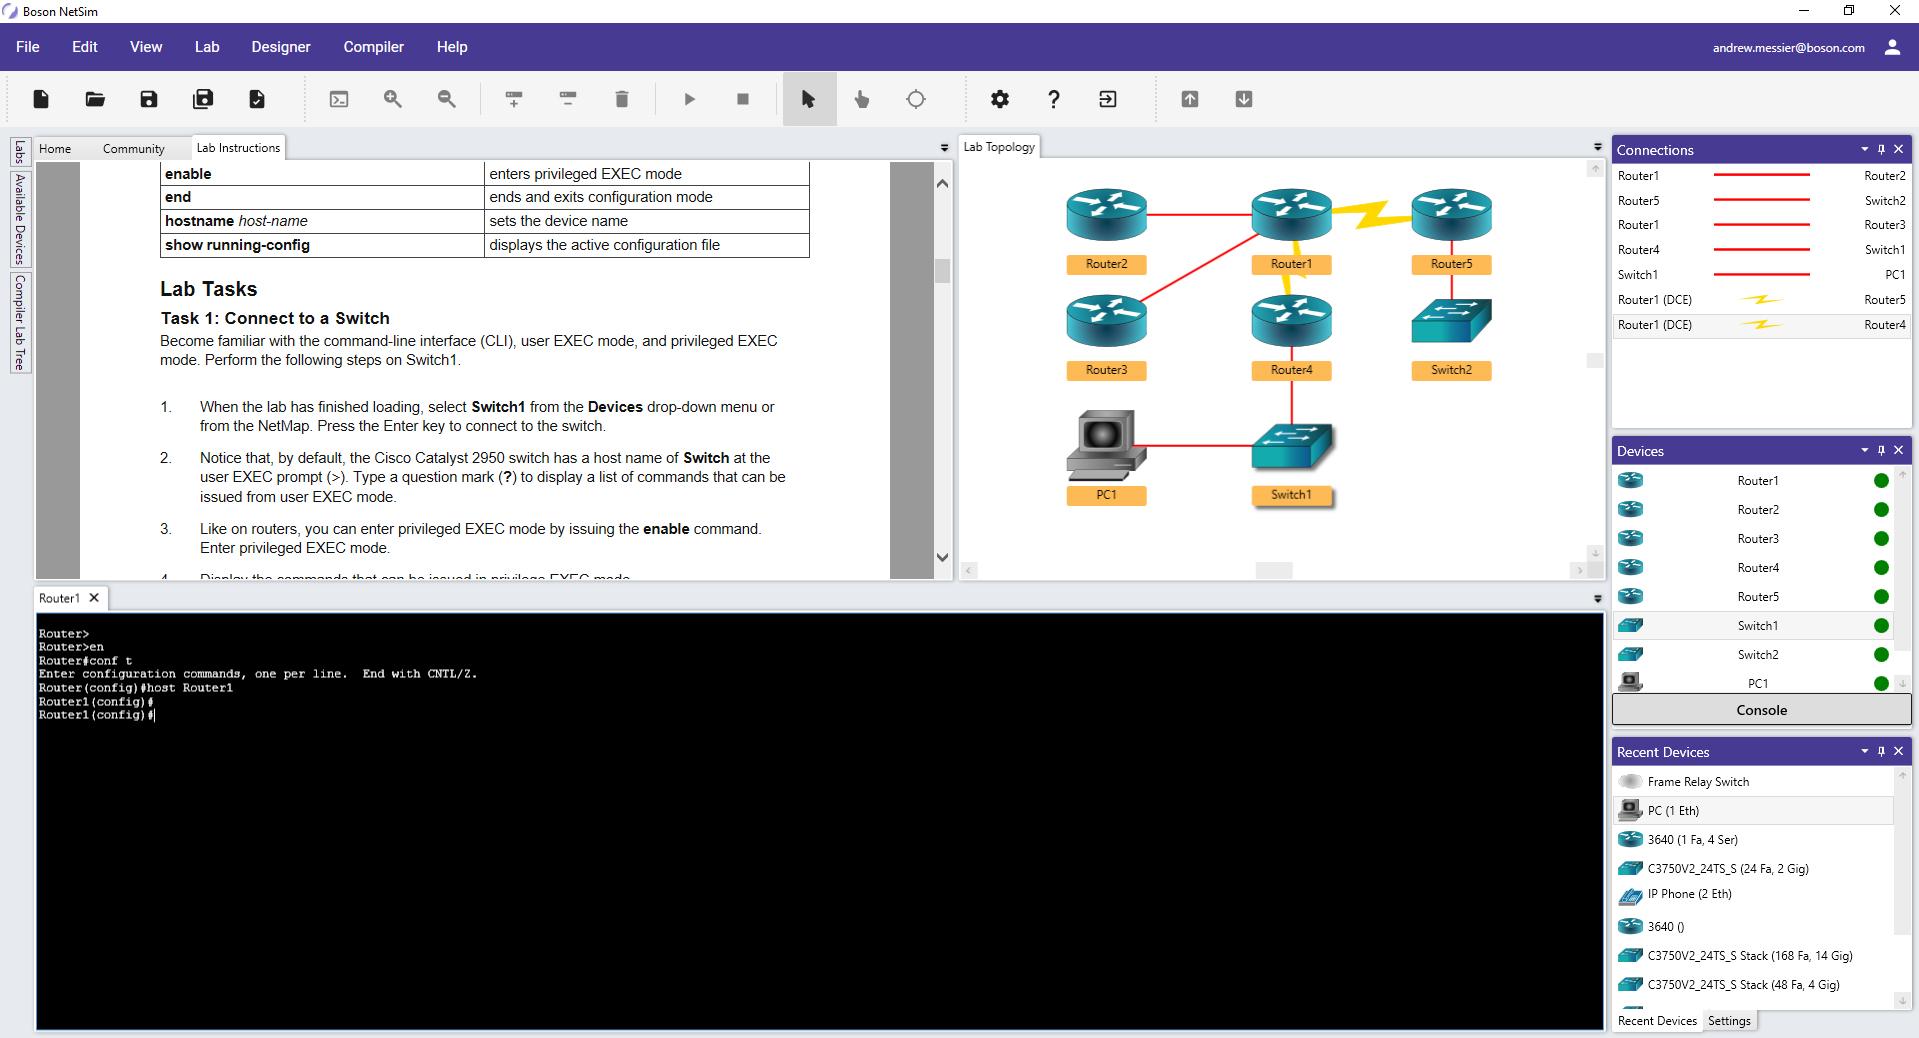 hight resolution of netsim 12 network simulator lab and topology view